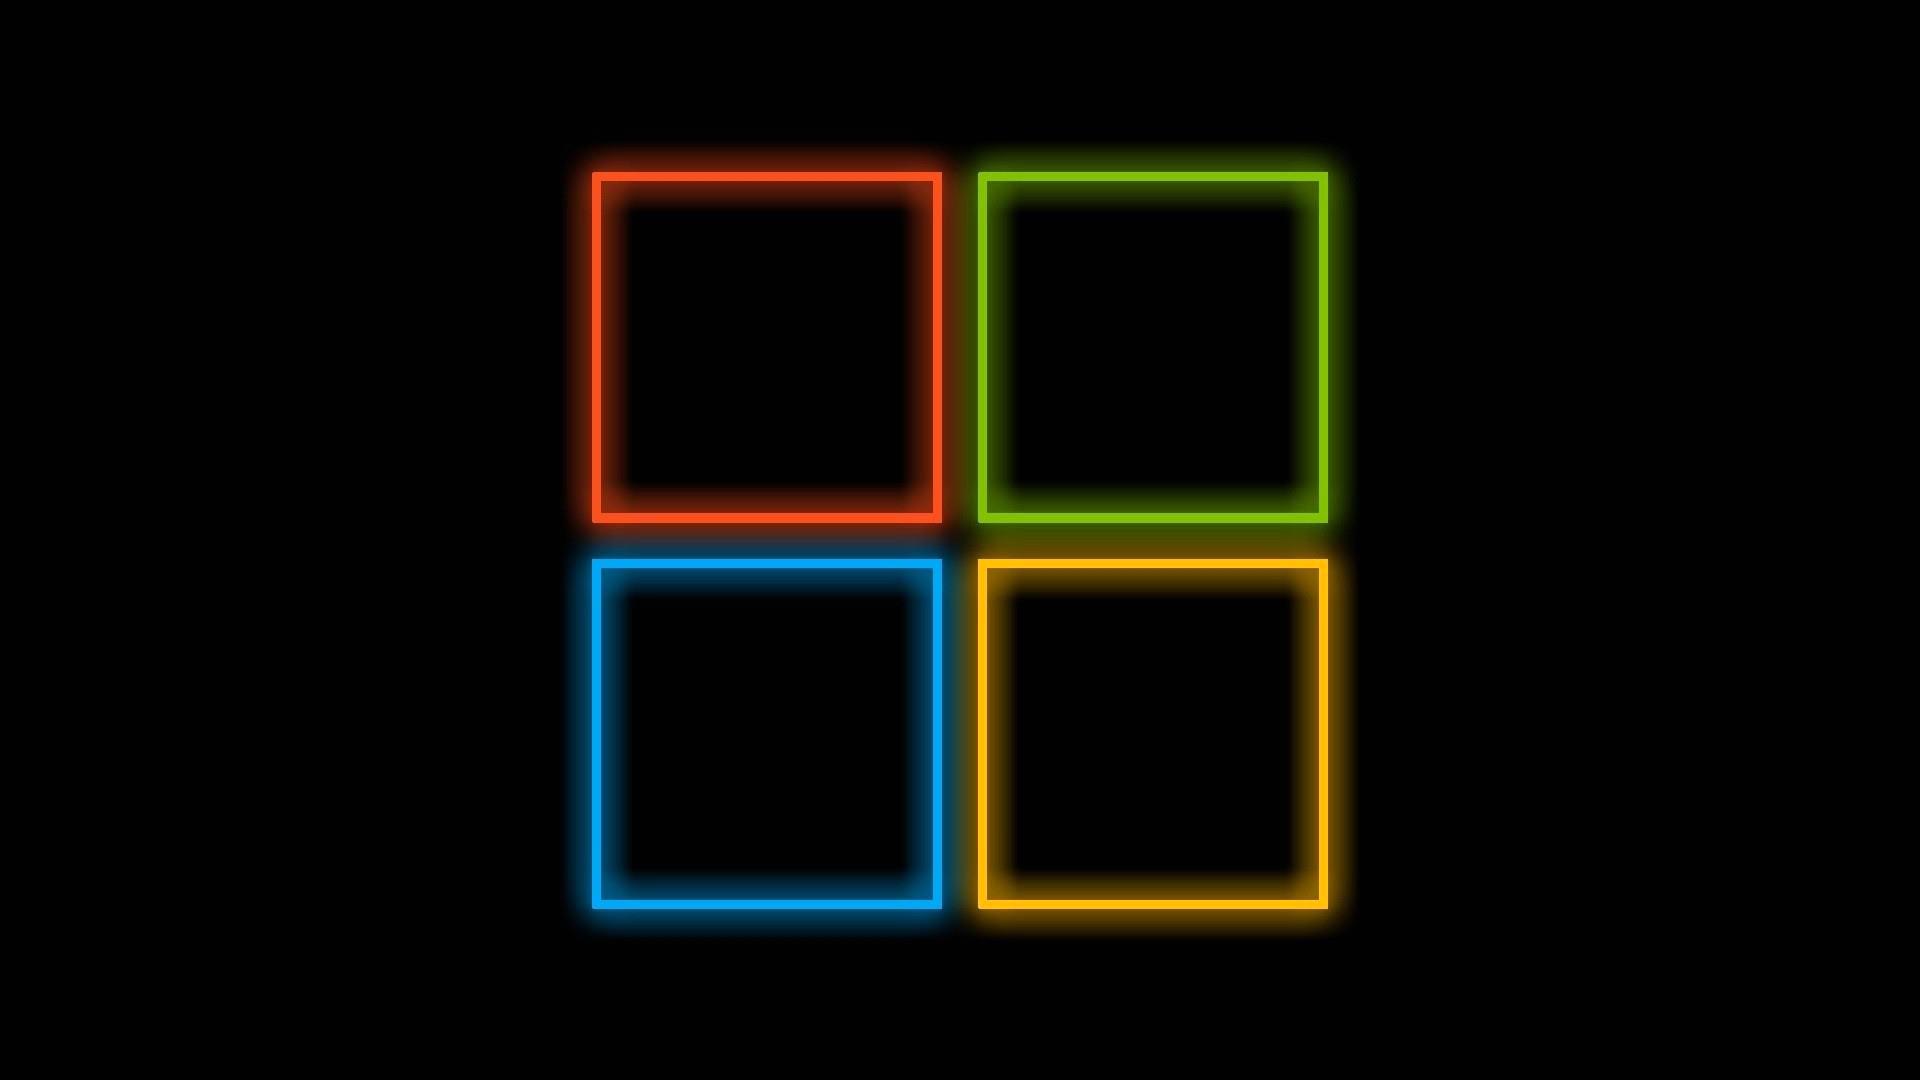 wallpaper : minimalism, text, pattern, circle, operating system